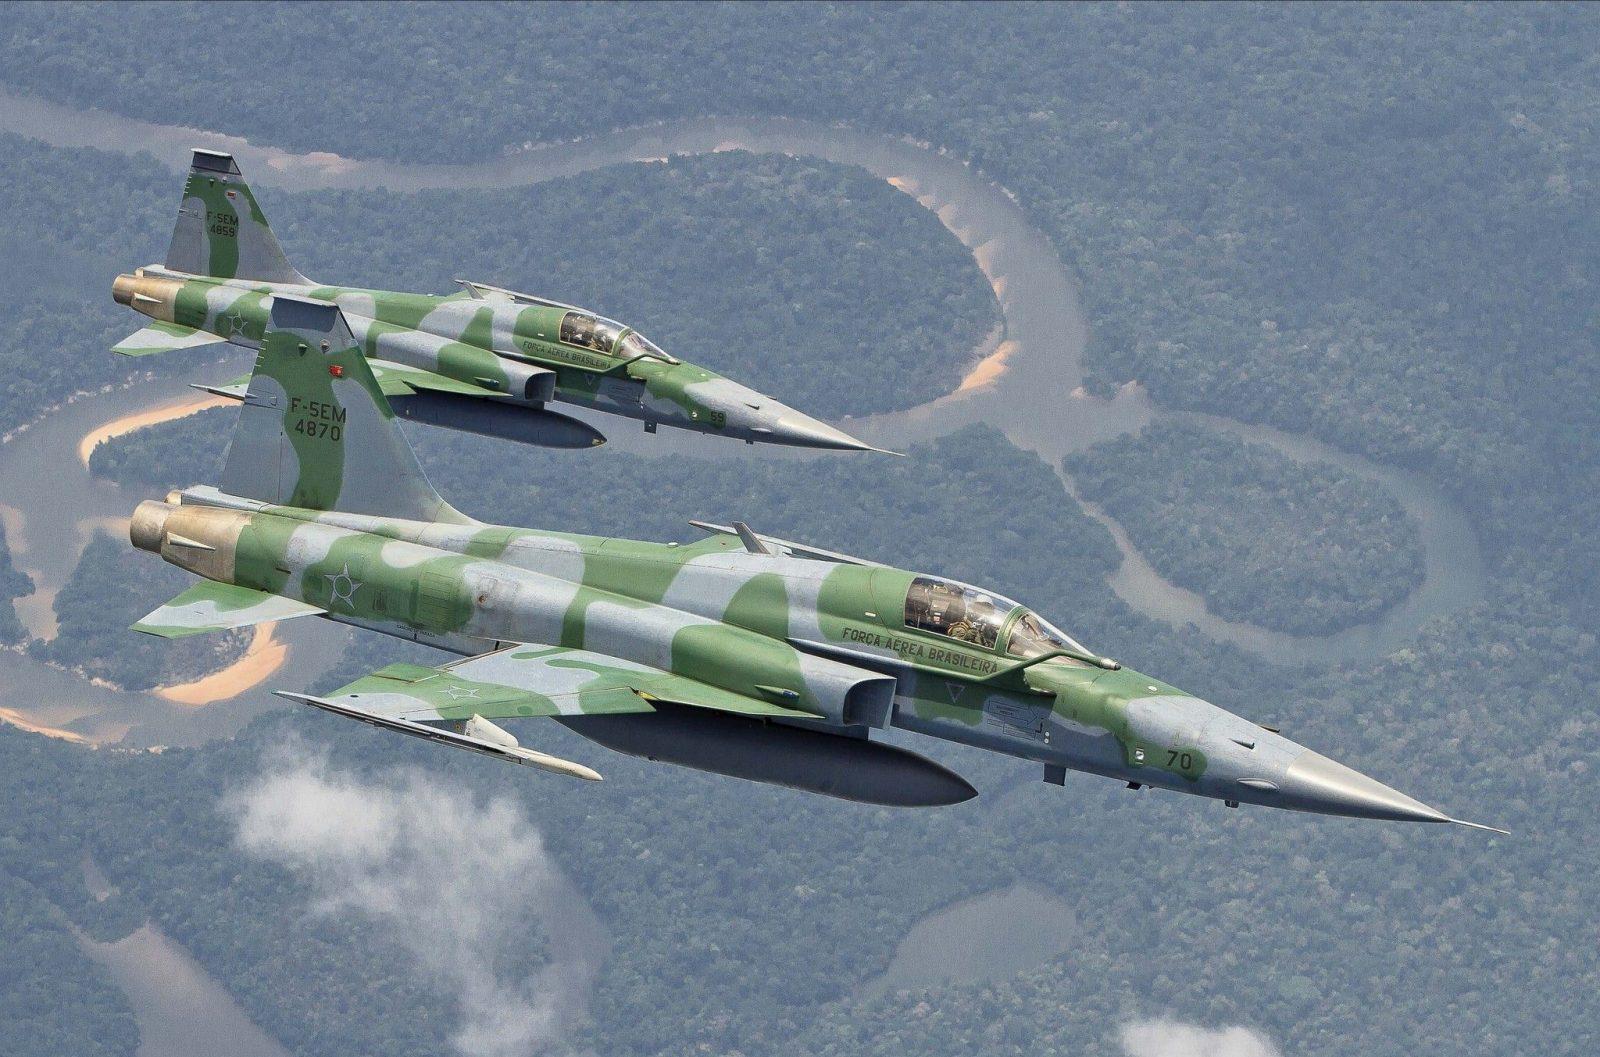 Brazilian Air Force F-5 fighter crashed near Rio de Janeiro